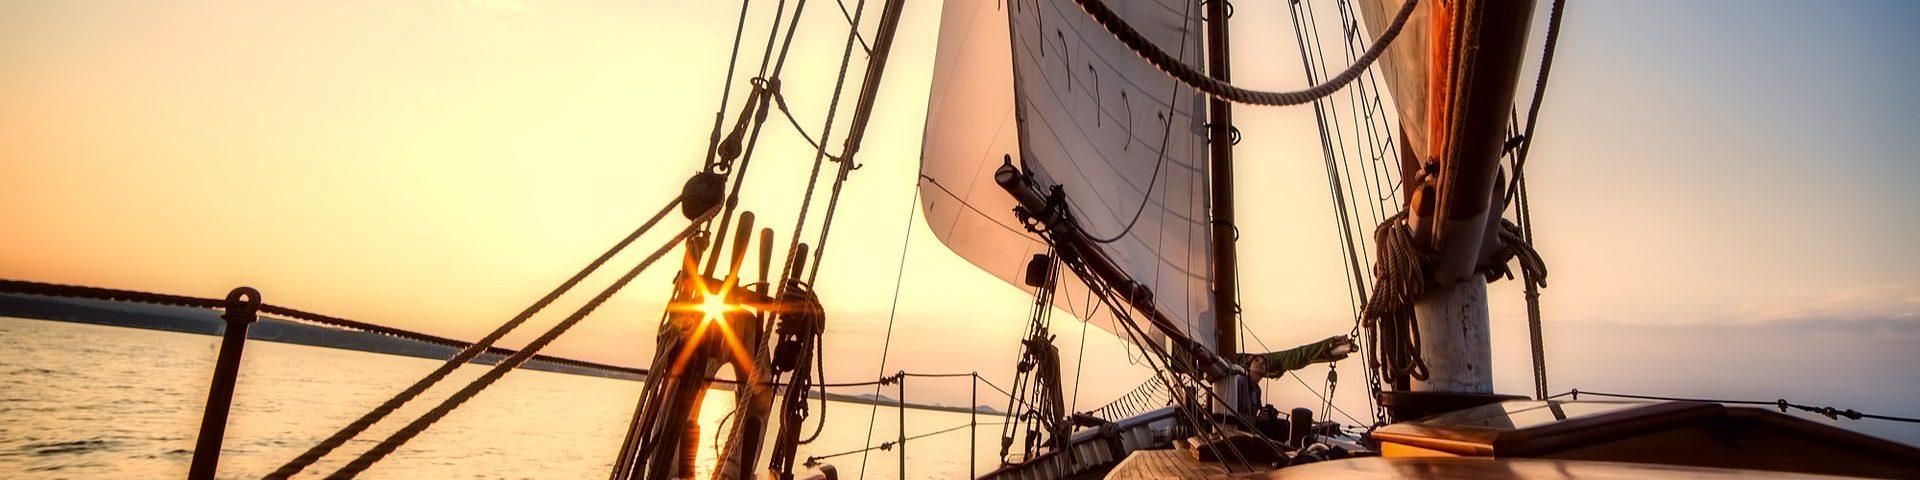 sailing 2542901 1920 1920x480 - Wino pod żaglami